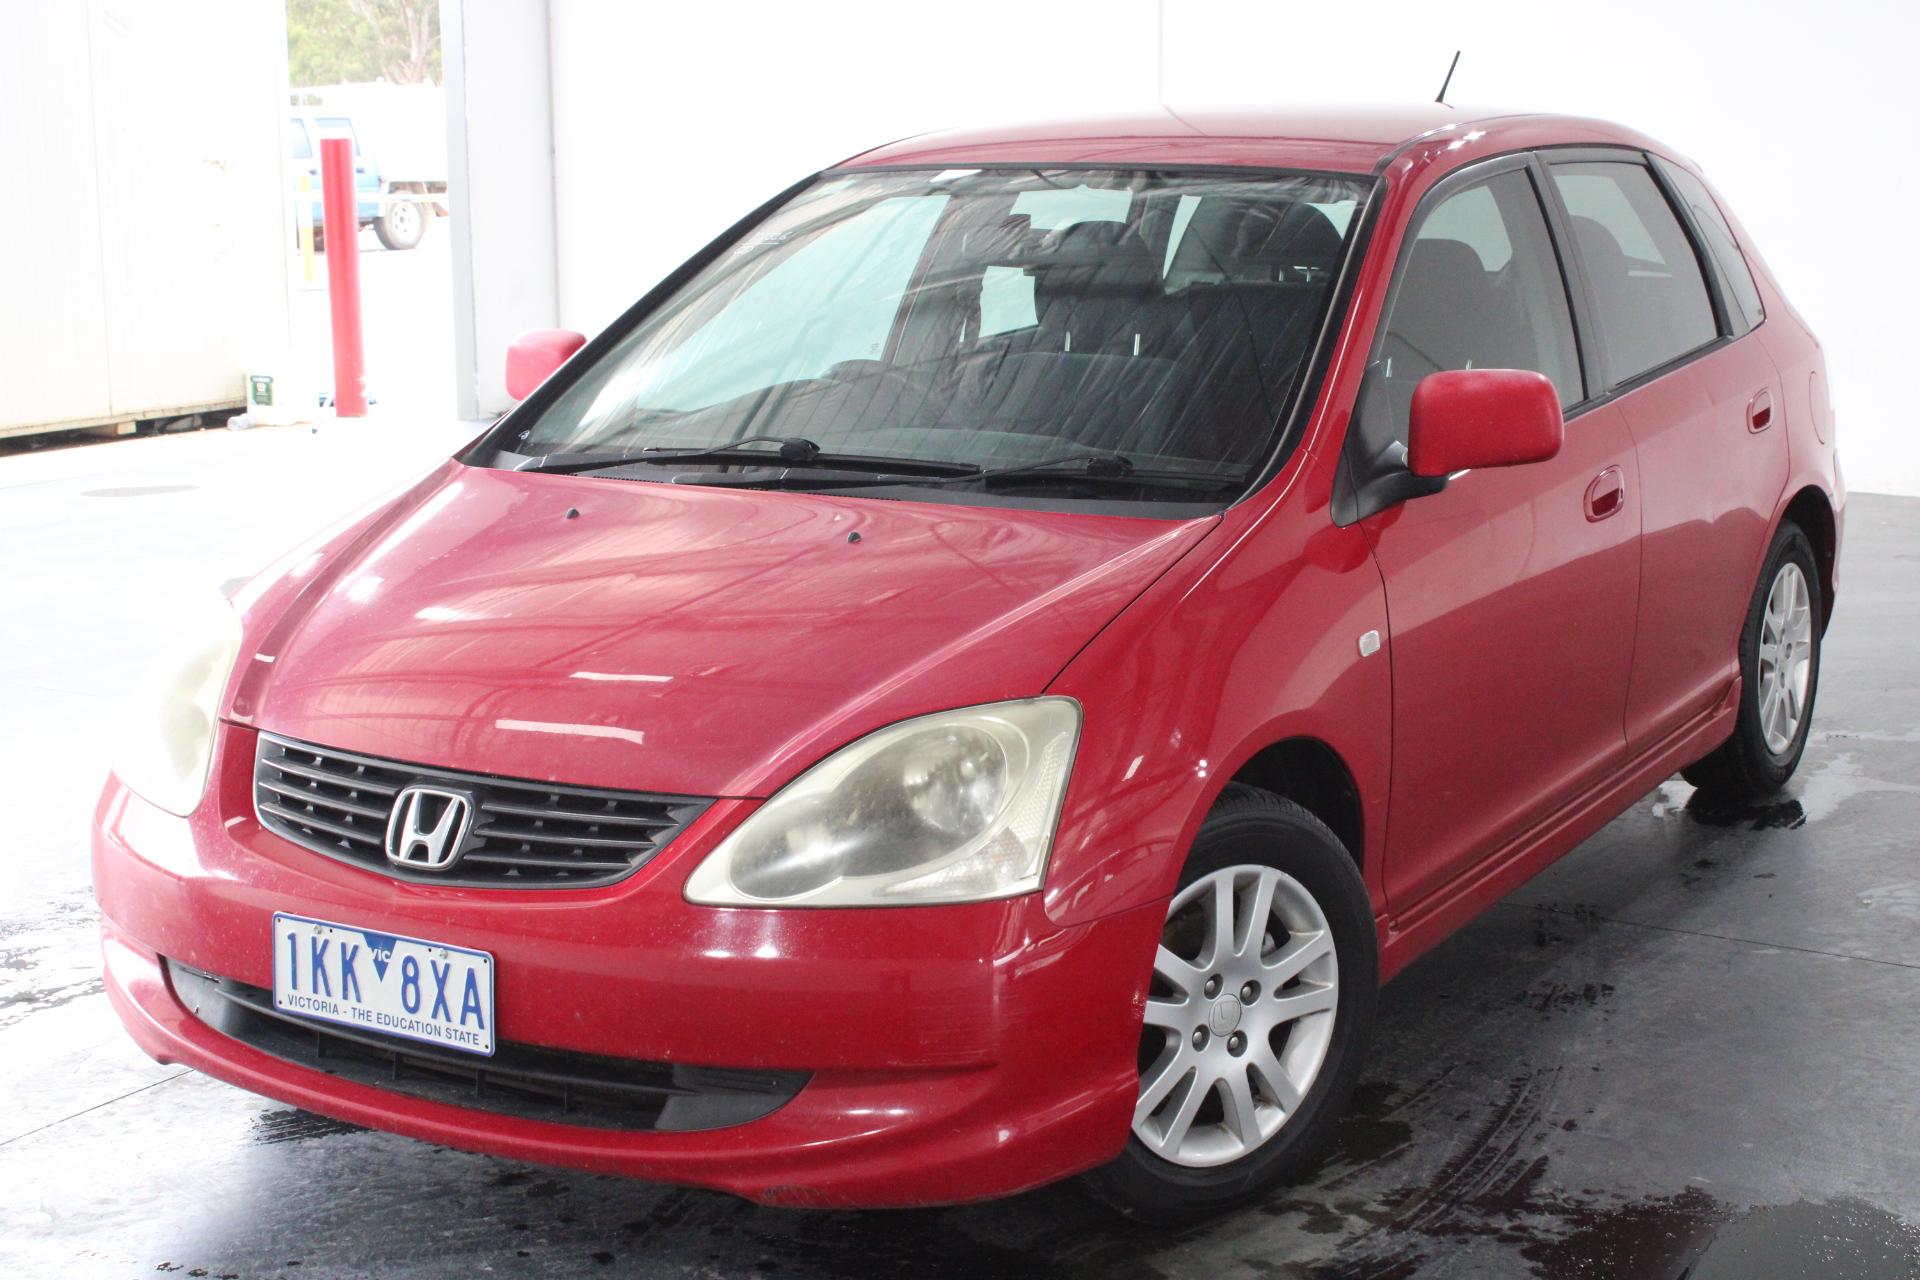 2004 Honda Civic VI 7th Gen Automatic Hatchback